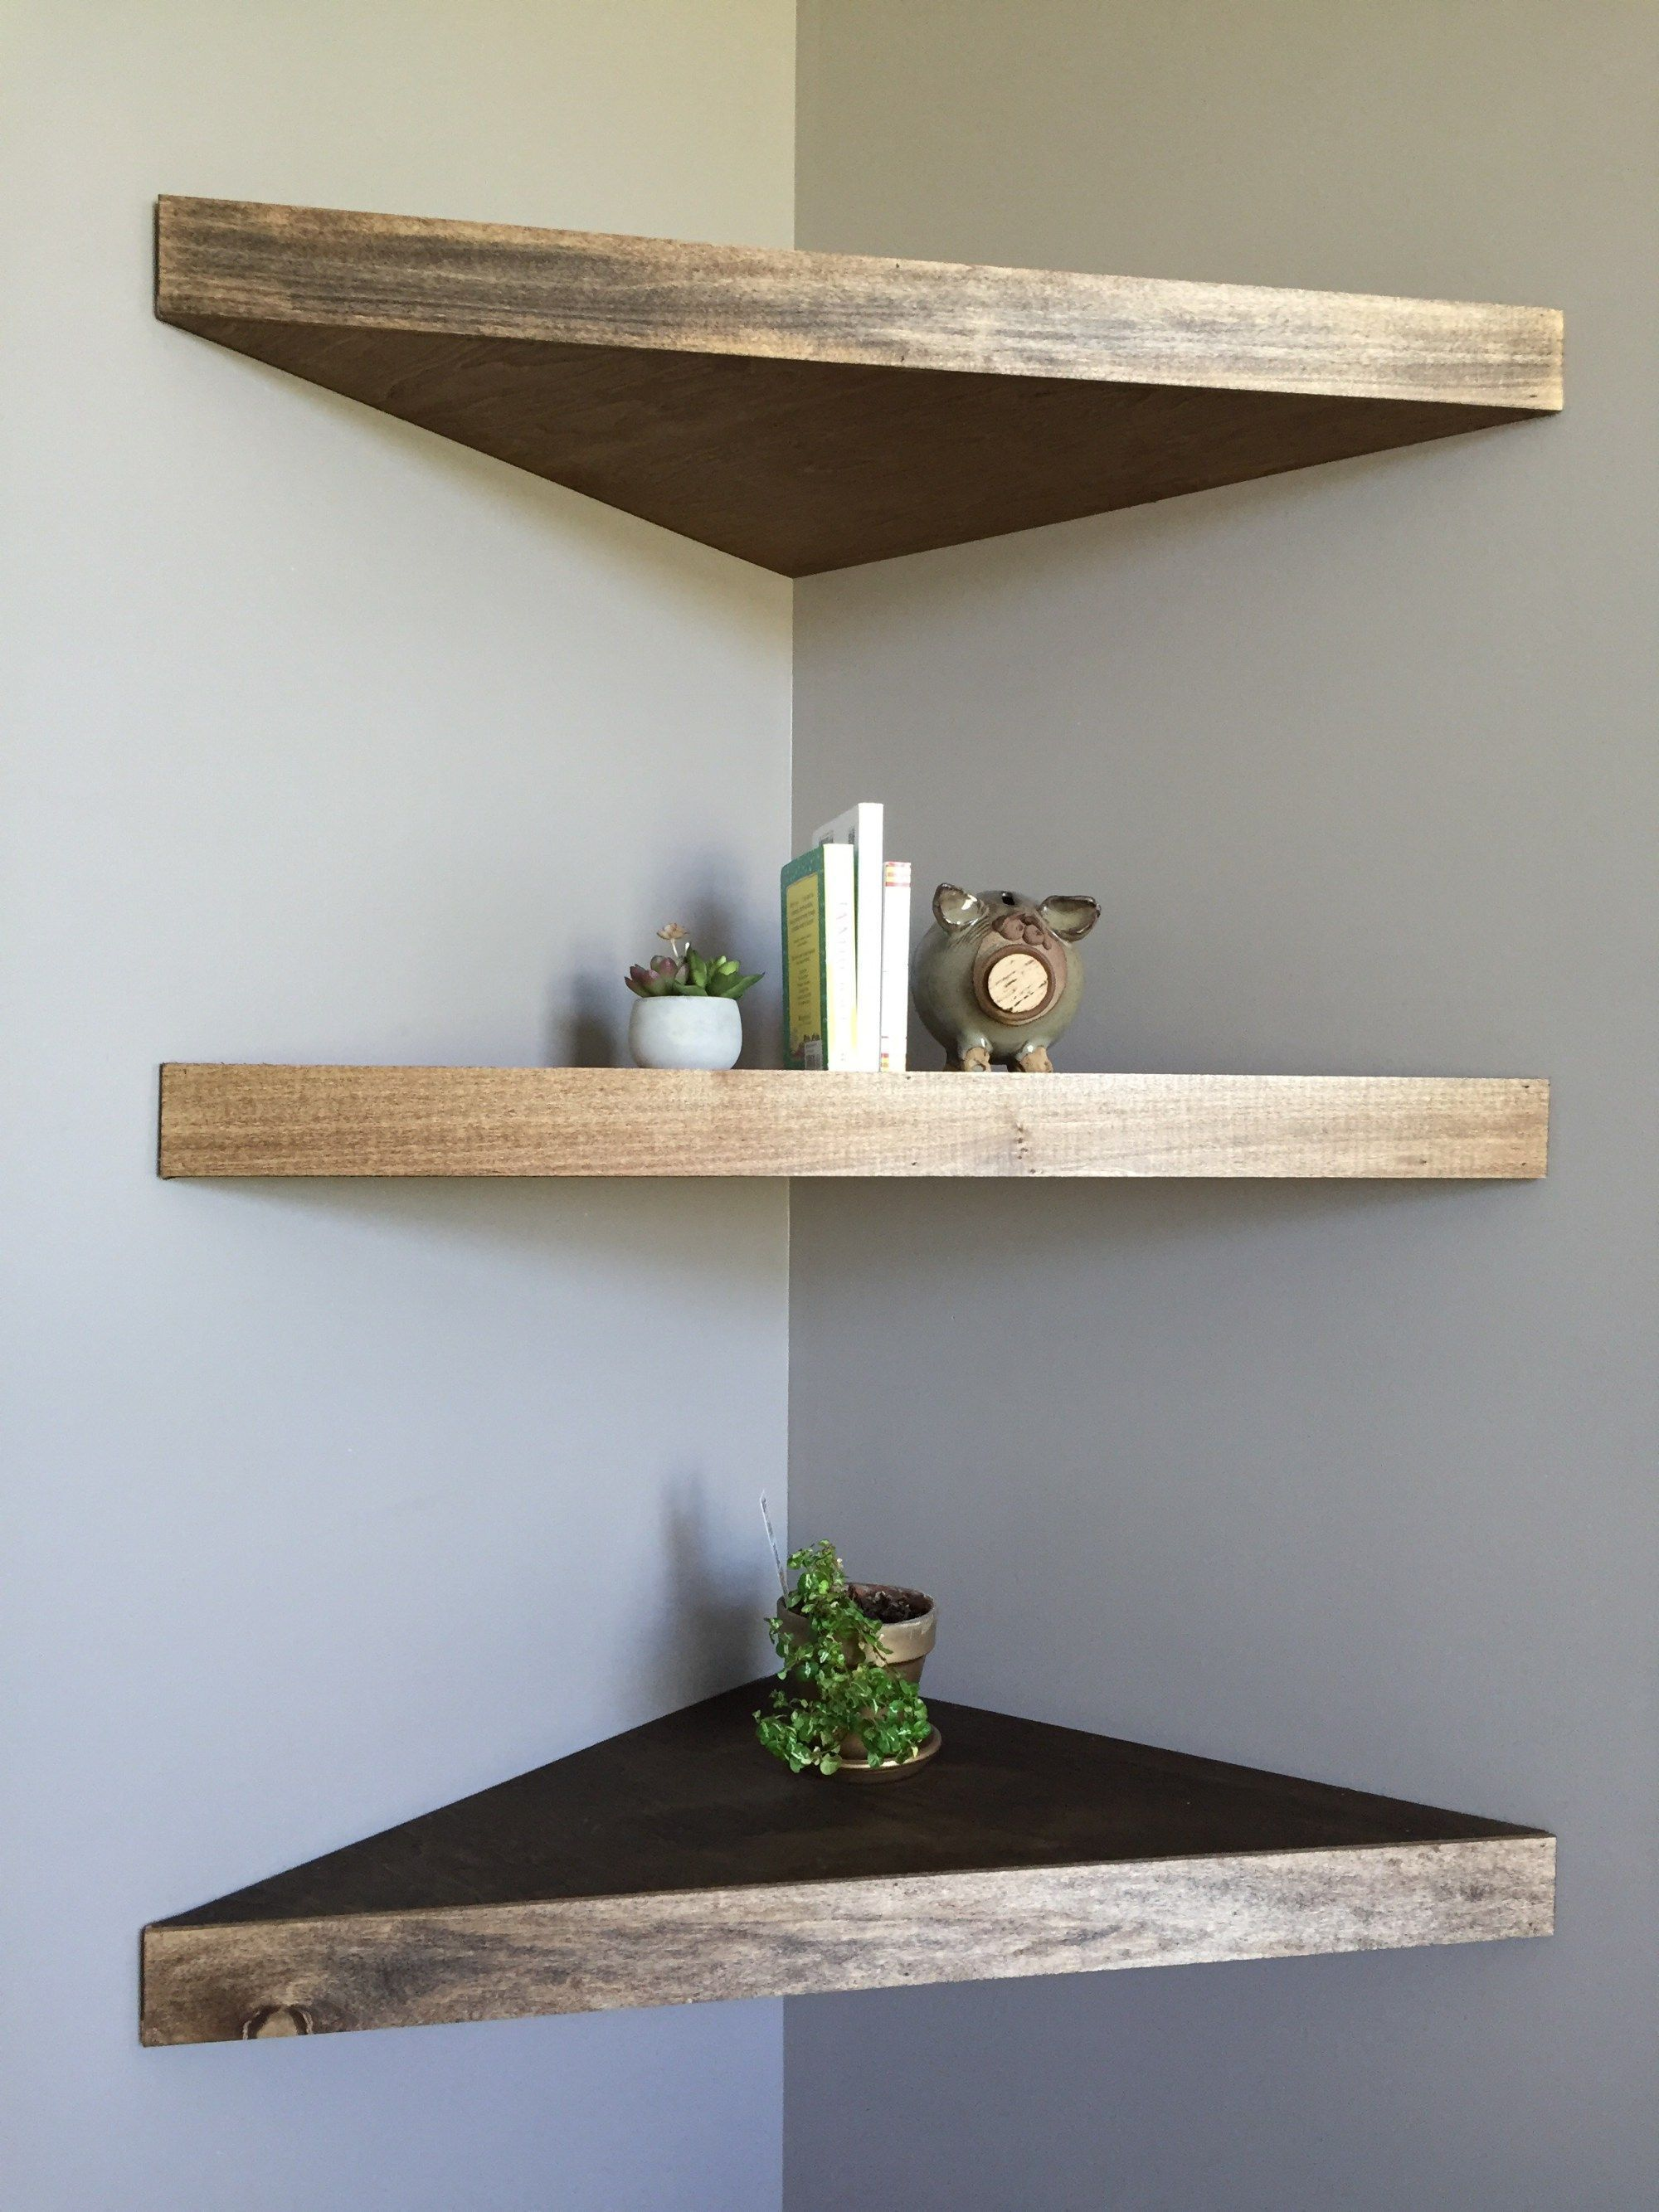 5 Unique Ideas Can Change Your Life Floating Shelf Desk Wall Colors Floating Shelf Hallway Wood Corner Shelves Floating Shelves Diy Floating Shelves Bathroom